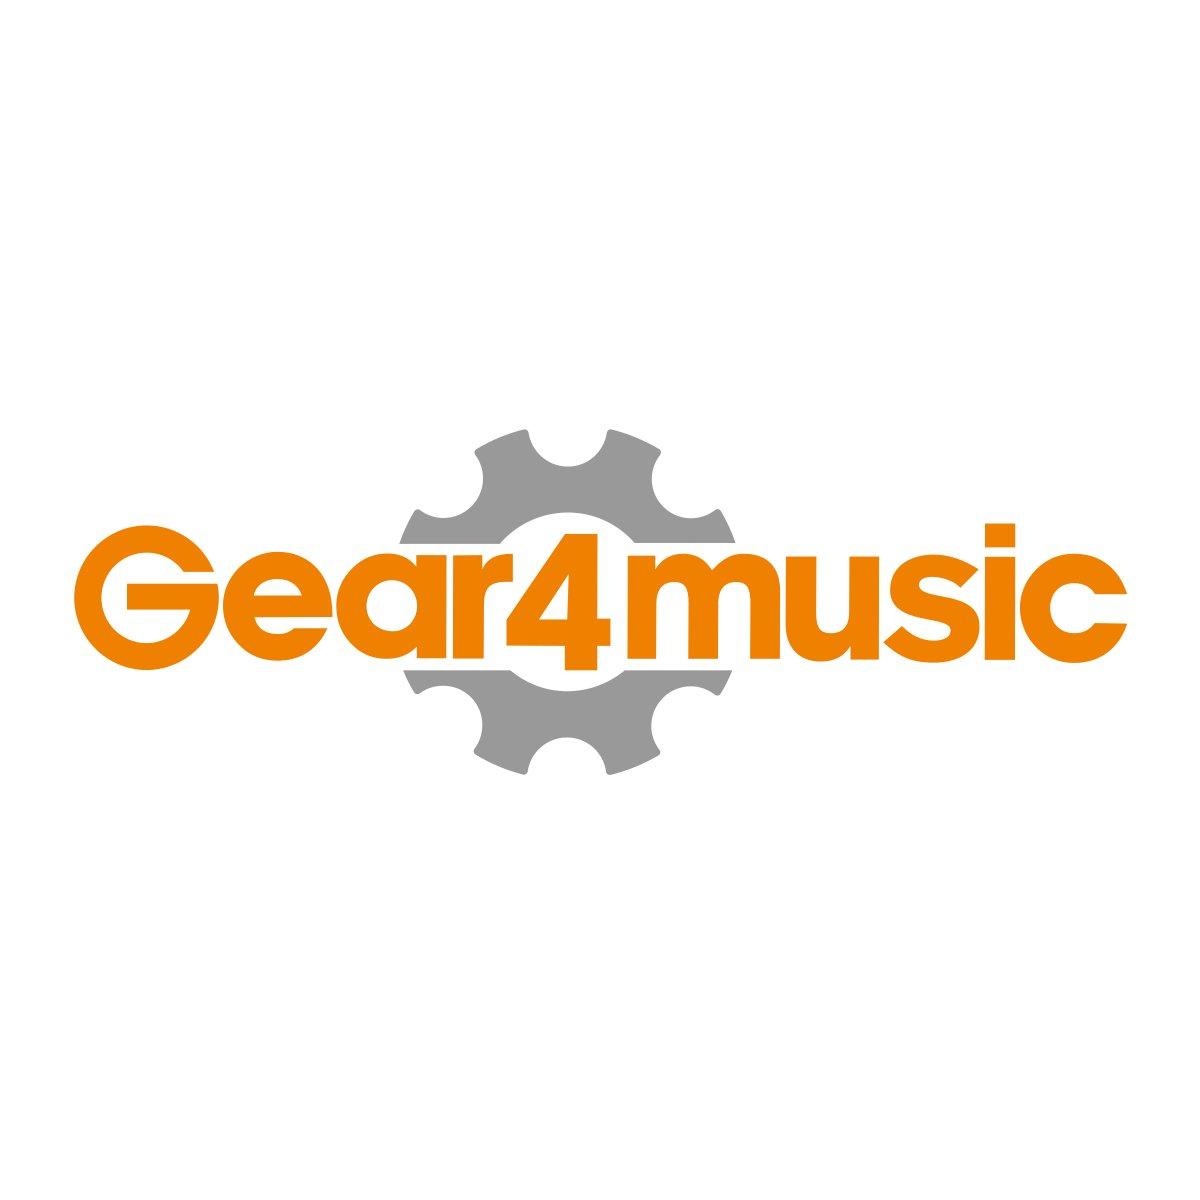 Piano Digital Vertical DP-90U de Gear4music + Pack de Accesorios